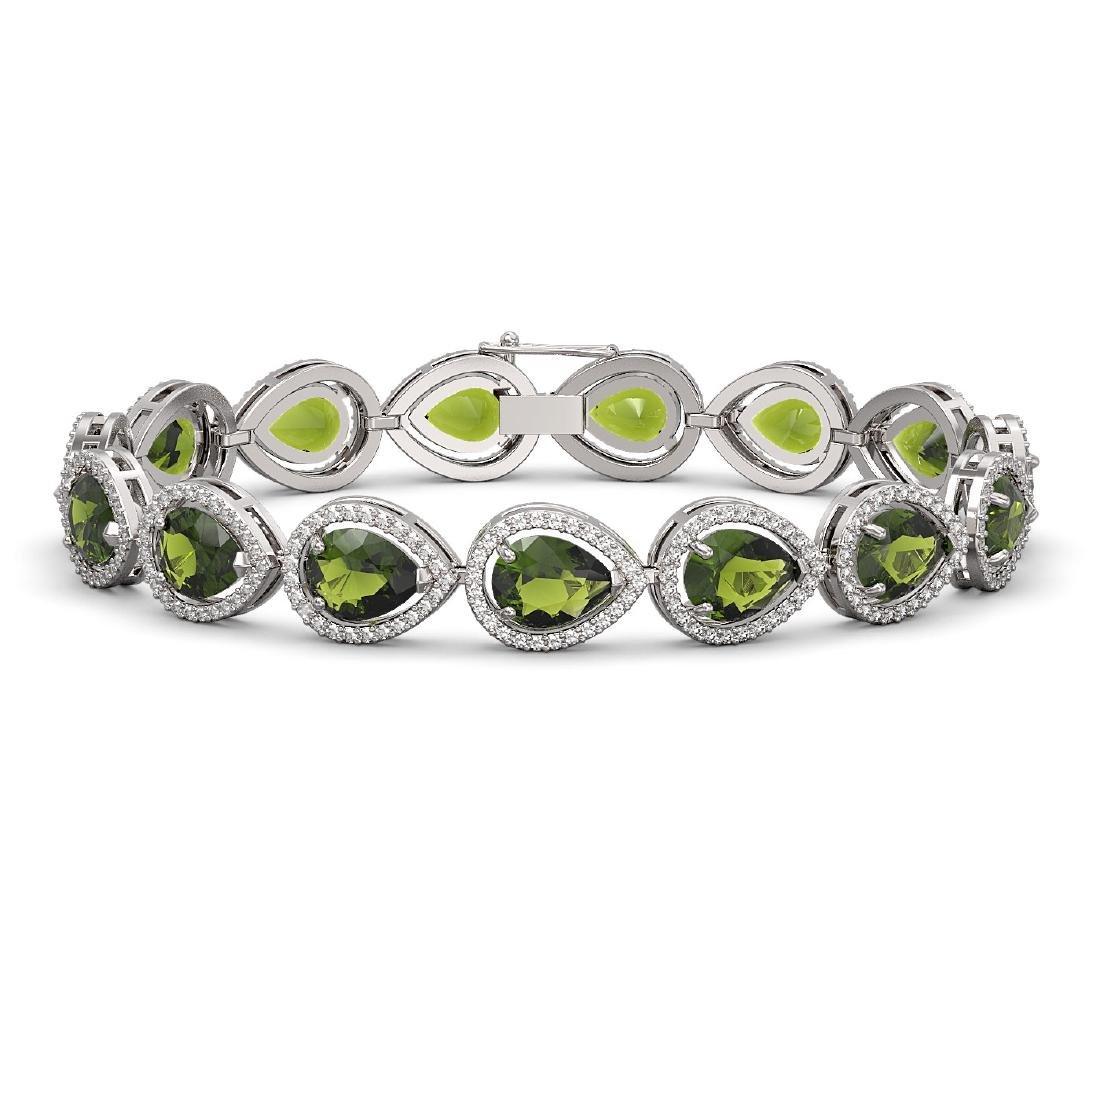 19.7 CTW Tourmaline & Diamond Halo Bracelet 10K White